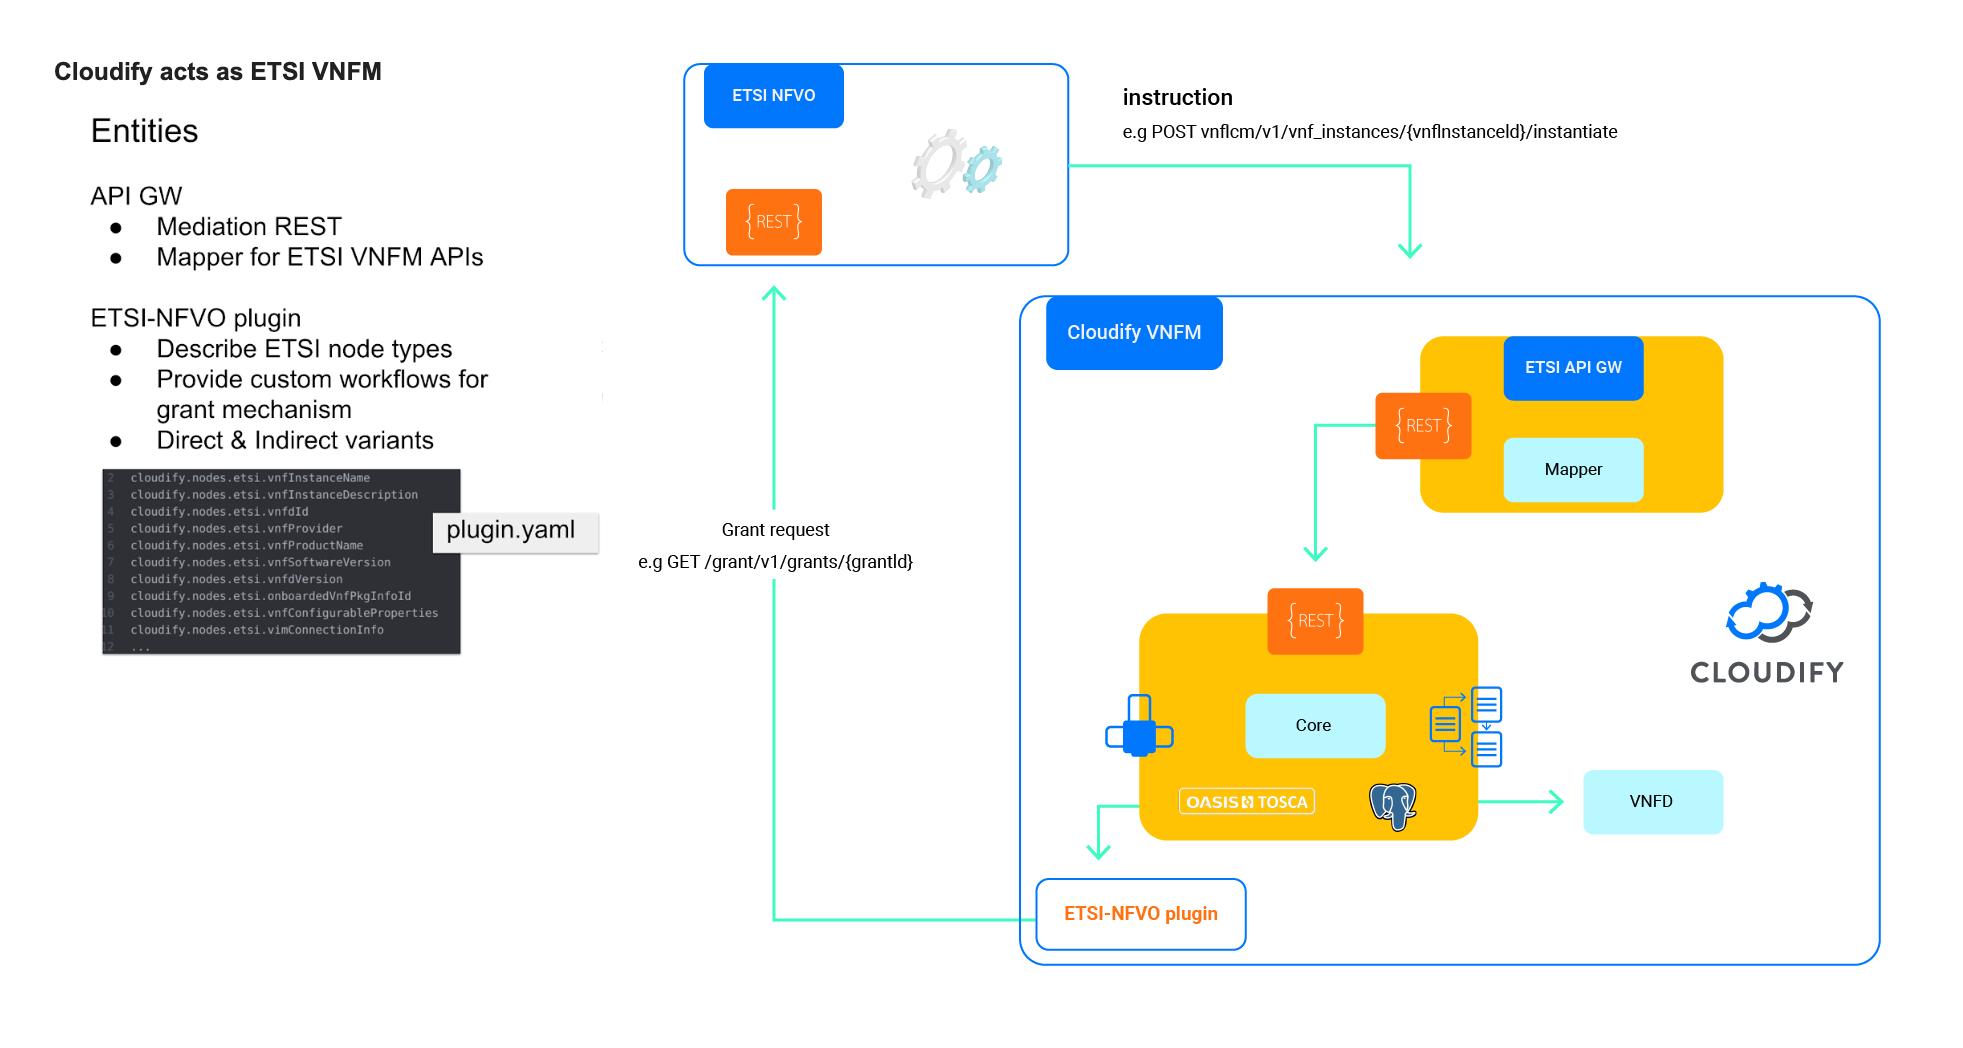 Cloudify acts as ETSI VNFM